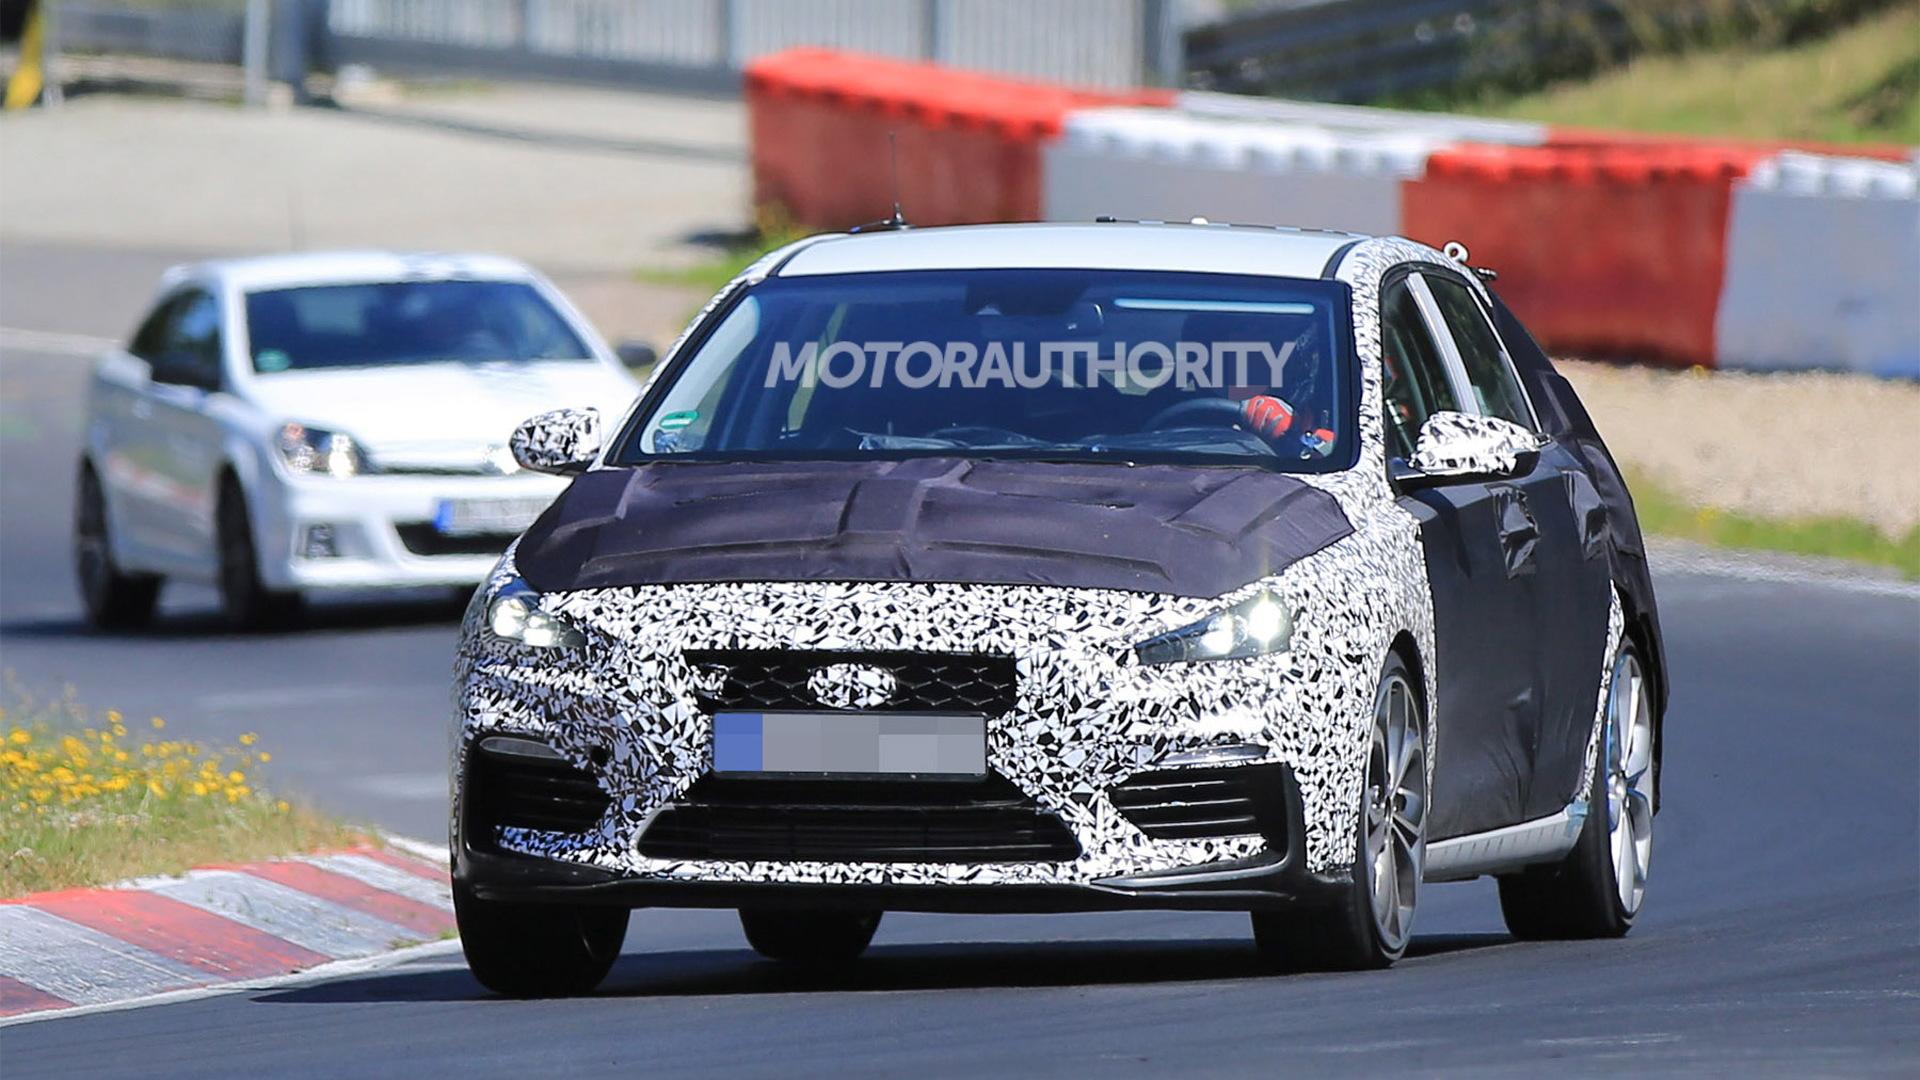 2018 Hyundai i30 N spy shots - Image via S. Baldauf/SB-Medien